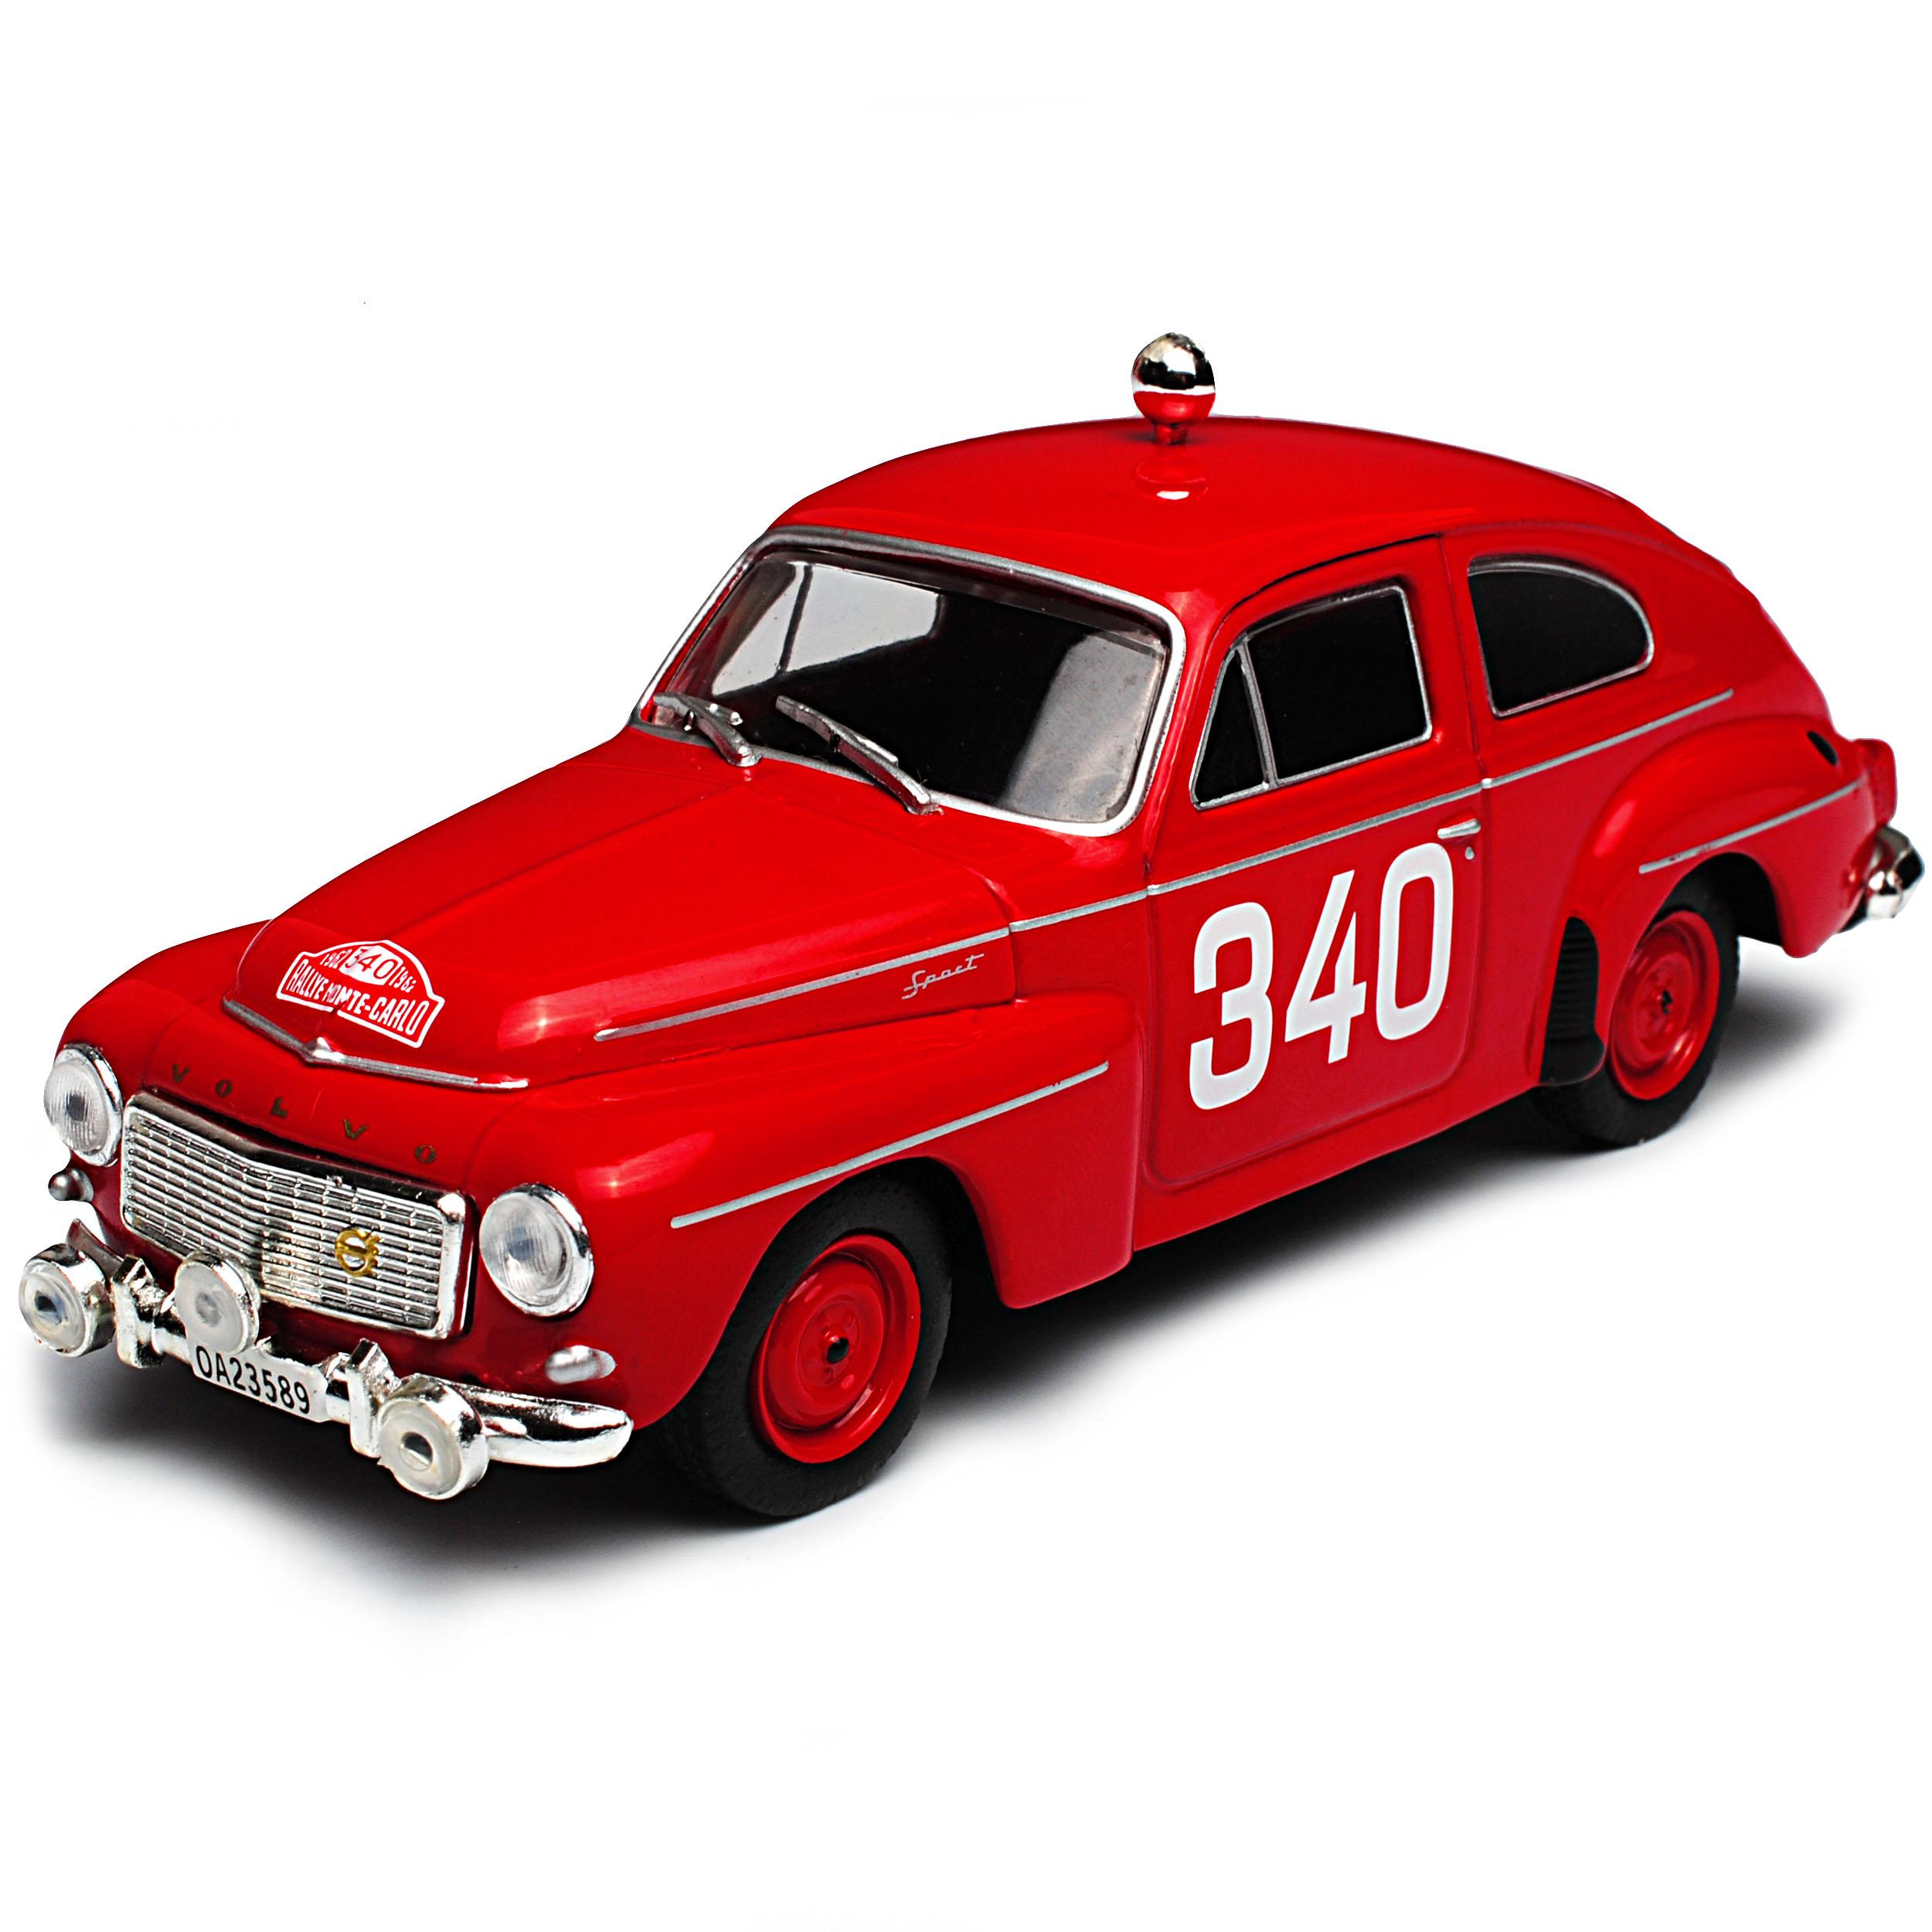 Volvo pv544 Rosqvist Sedán rojo rally rally rally de monte carlo 1958-1969 1 43 atlas mod.. 998295